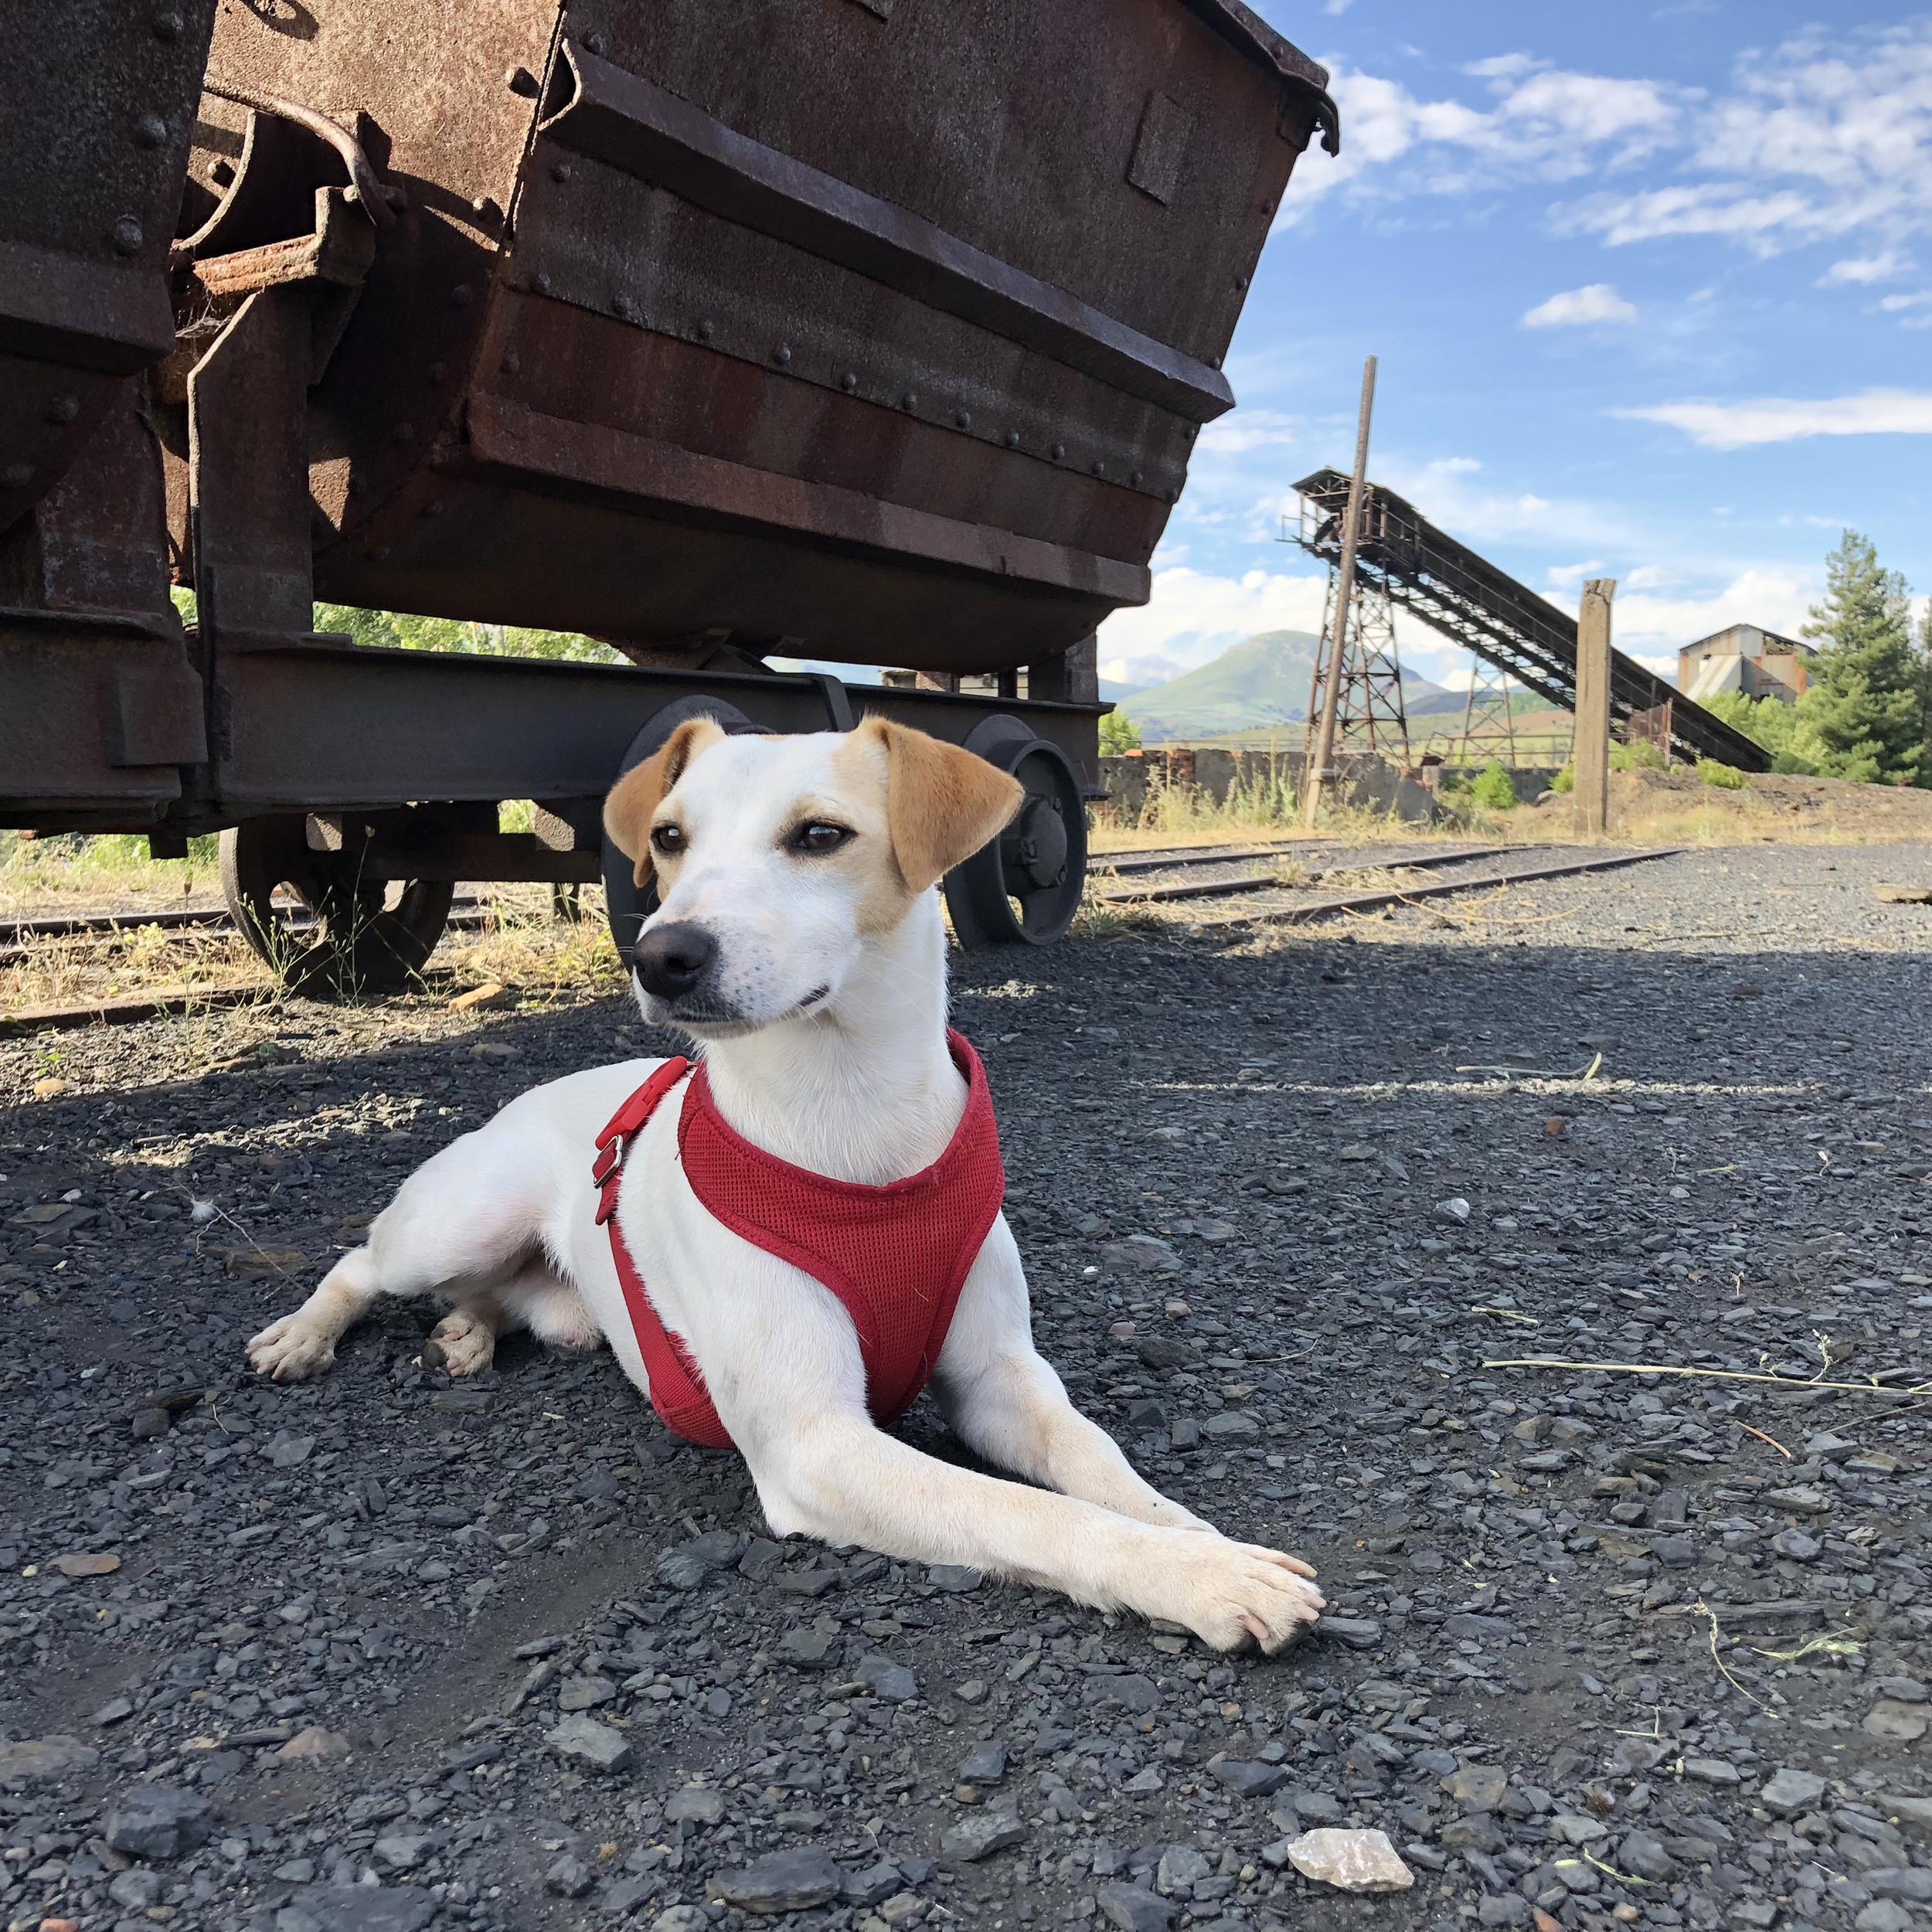 Visitas guiadas dog friendly en la mina Pozo Julia (en Fabero).